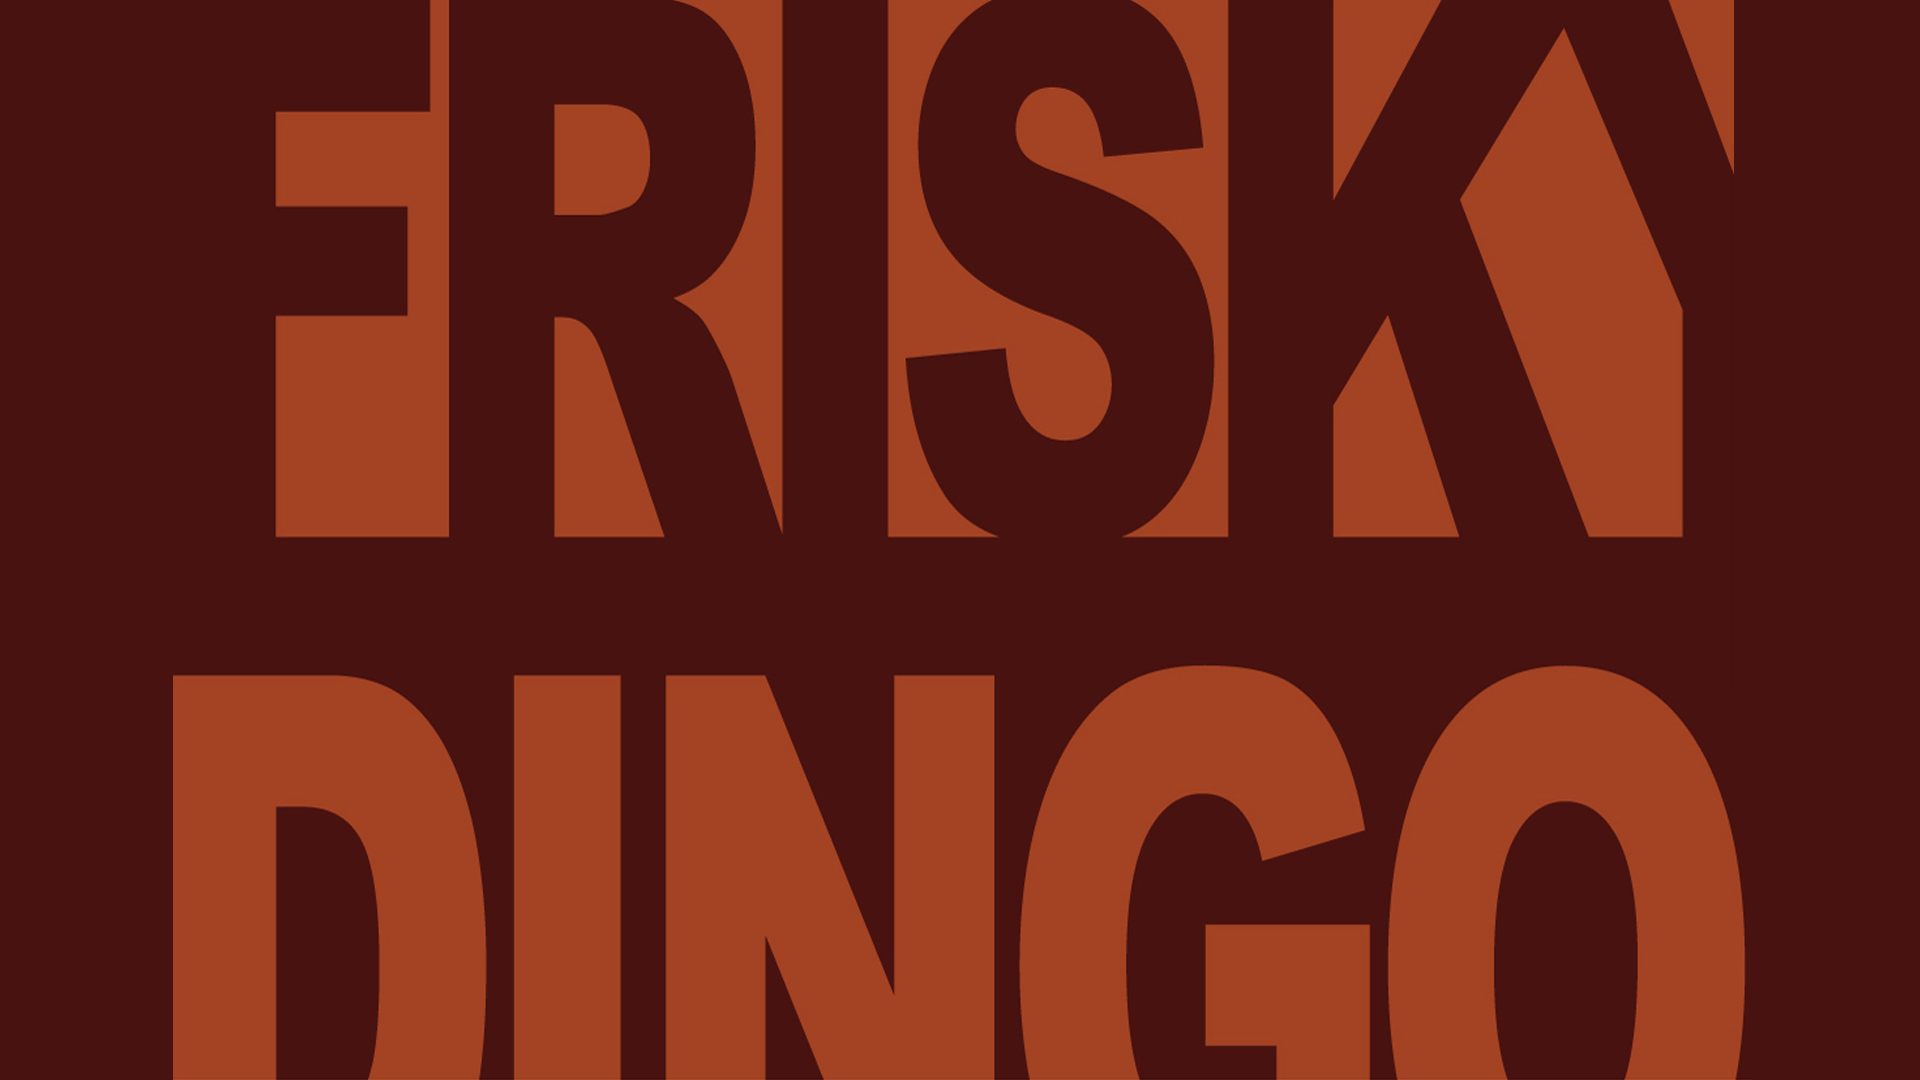 Frisky Dingo Season 1